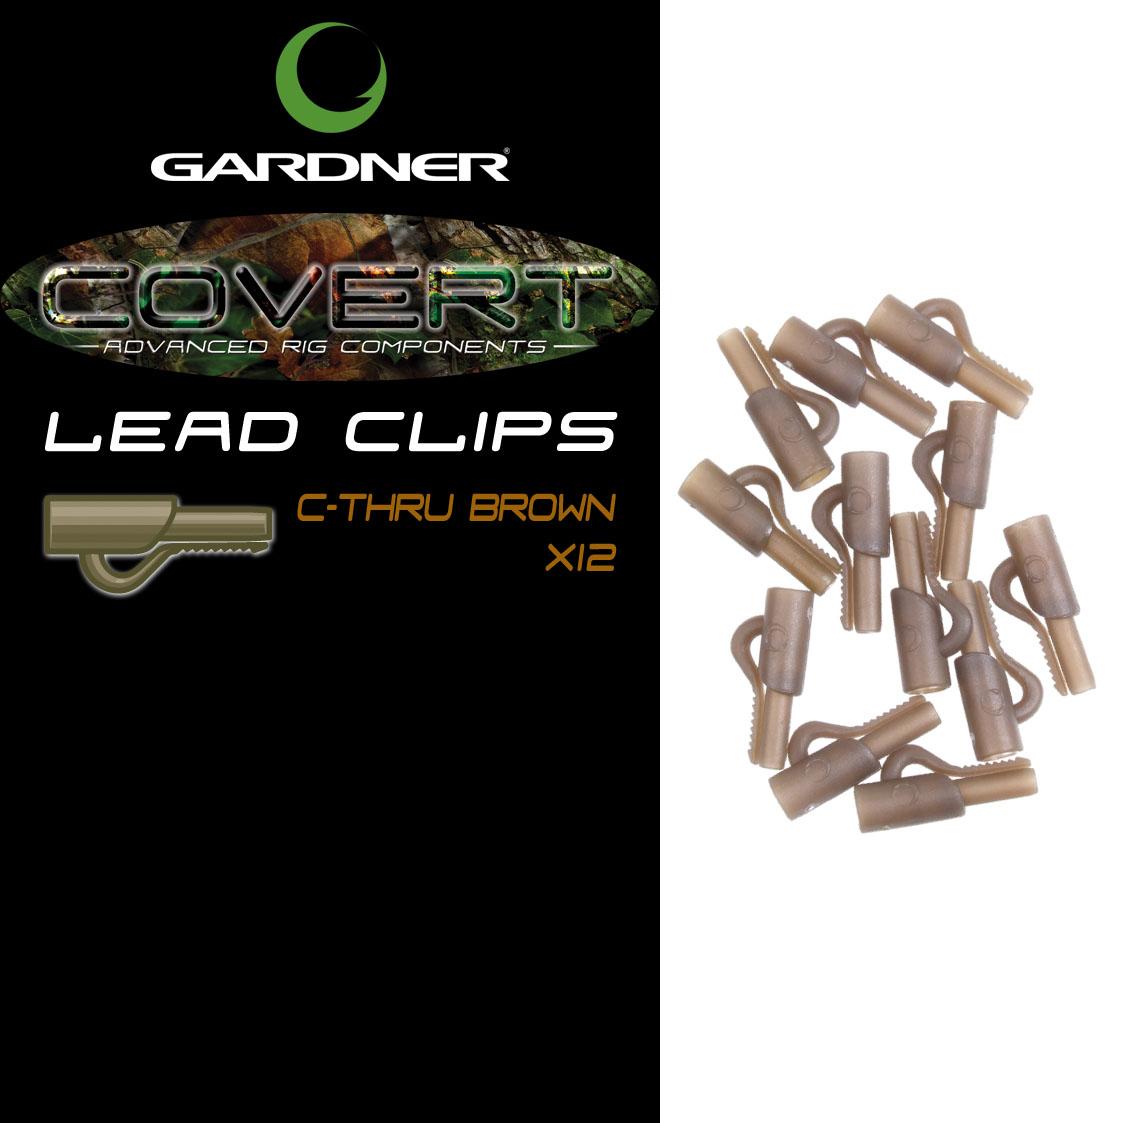 Gardner Covert Lead Clips C-Thru Green